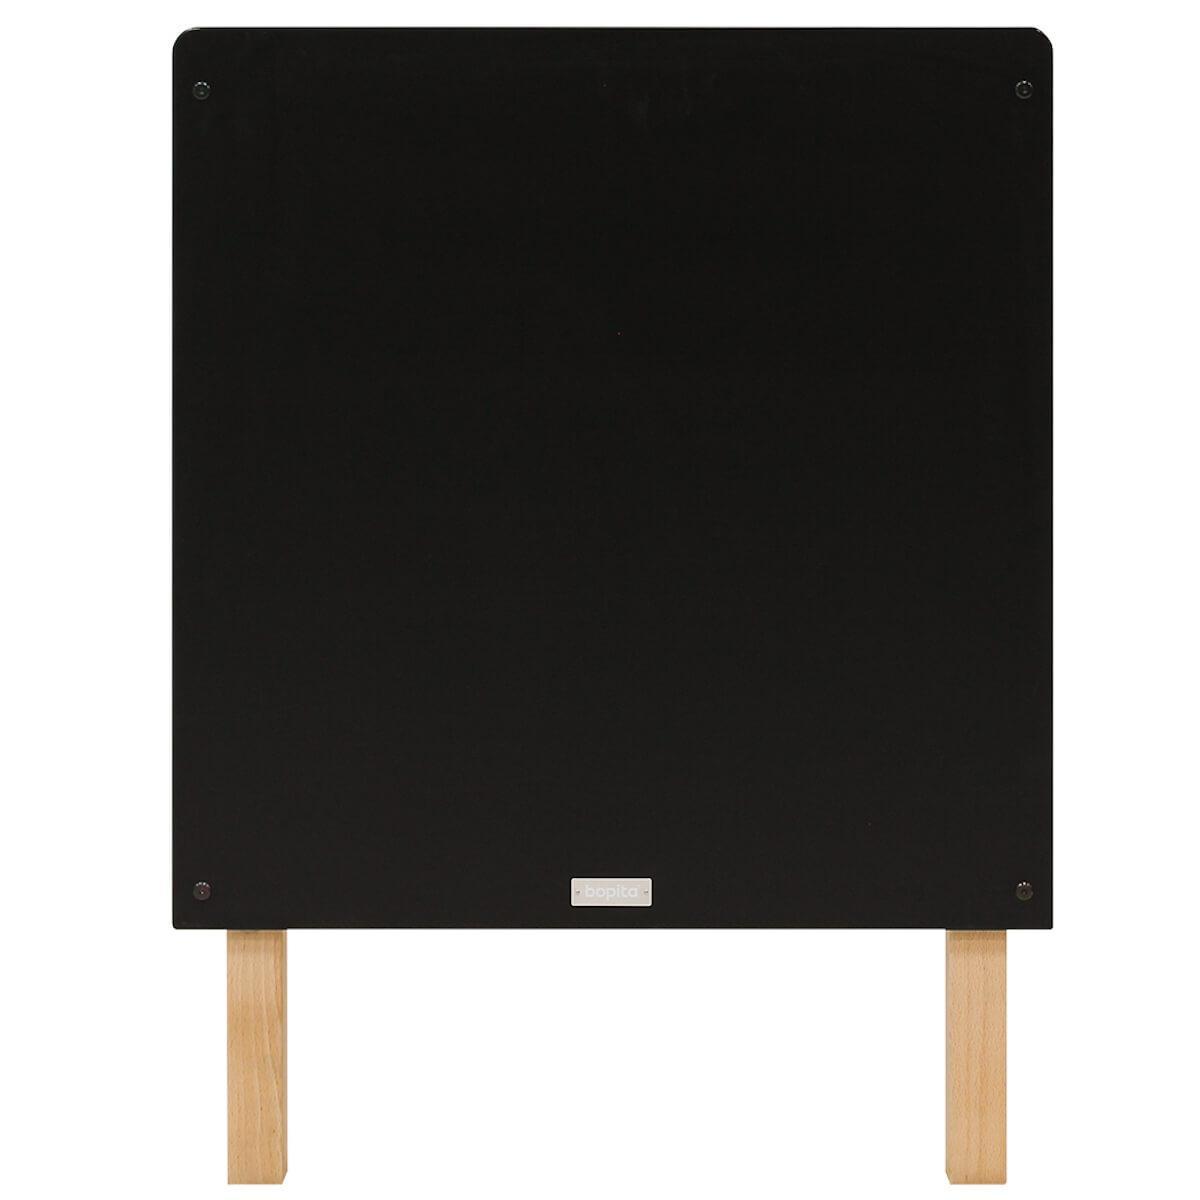 Cuna 60x120cm FLORIS Bopita negro mate-natural